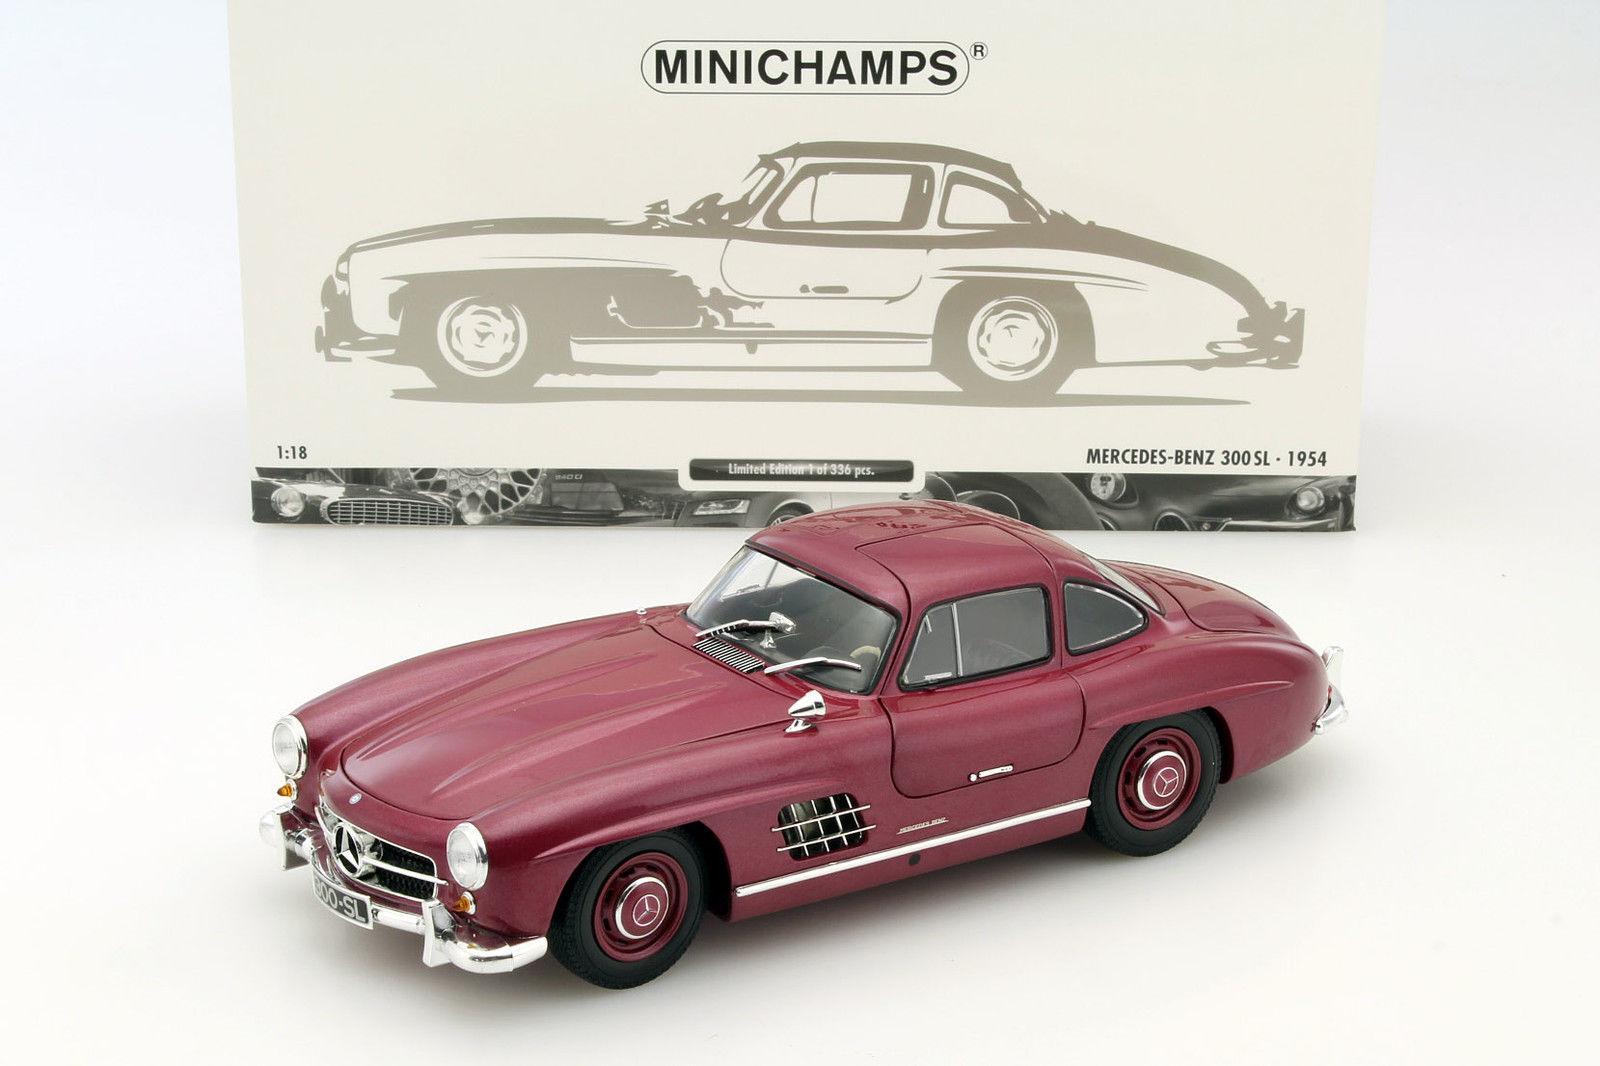 Minichamps 1 18 1954 Mercedes-Benz 300 SL auto Diecast Edición Limitada 180-039008